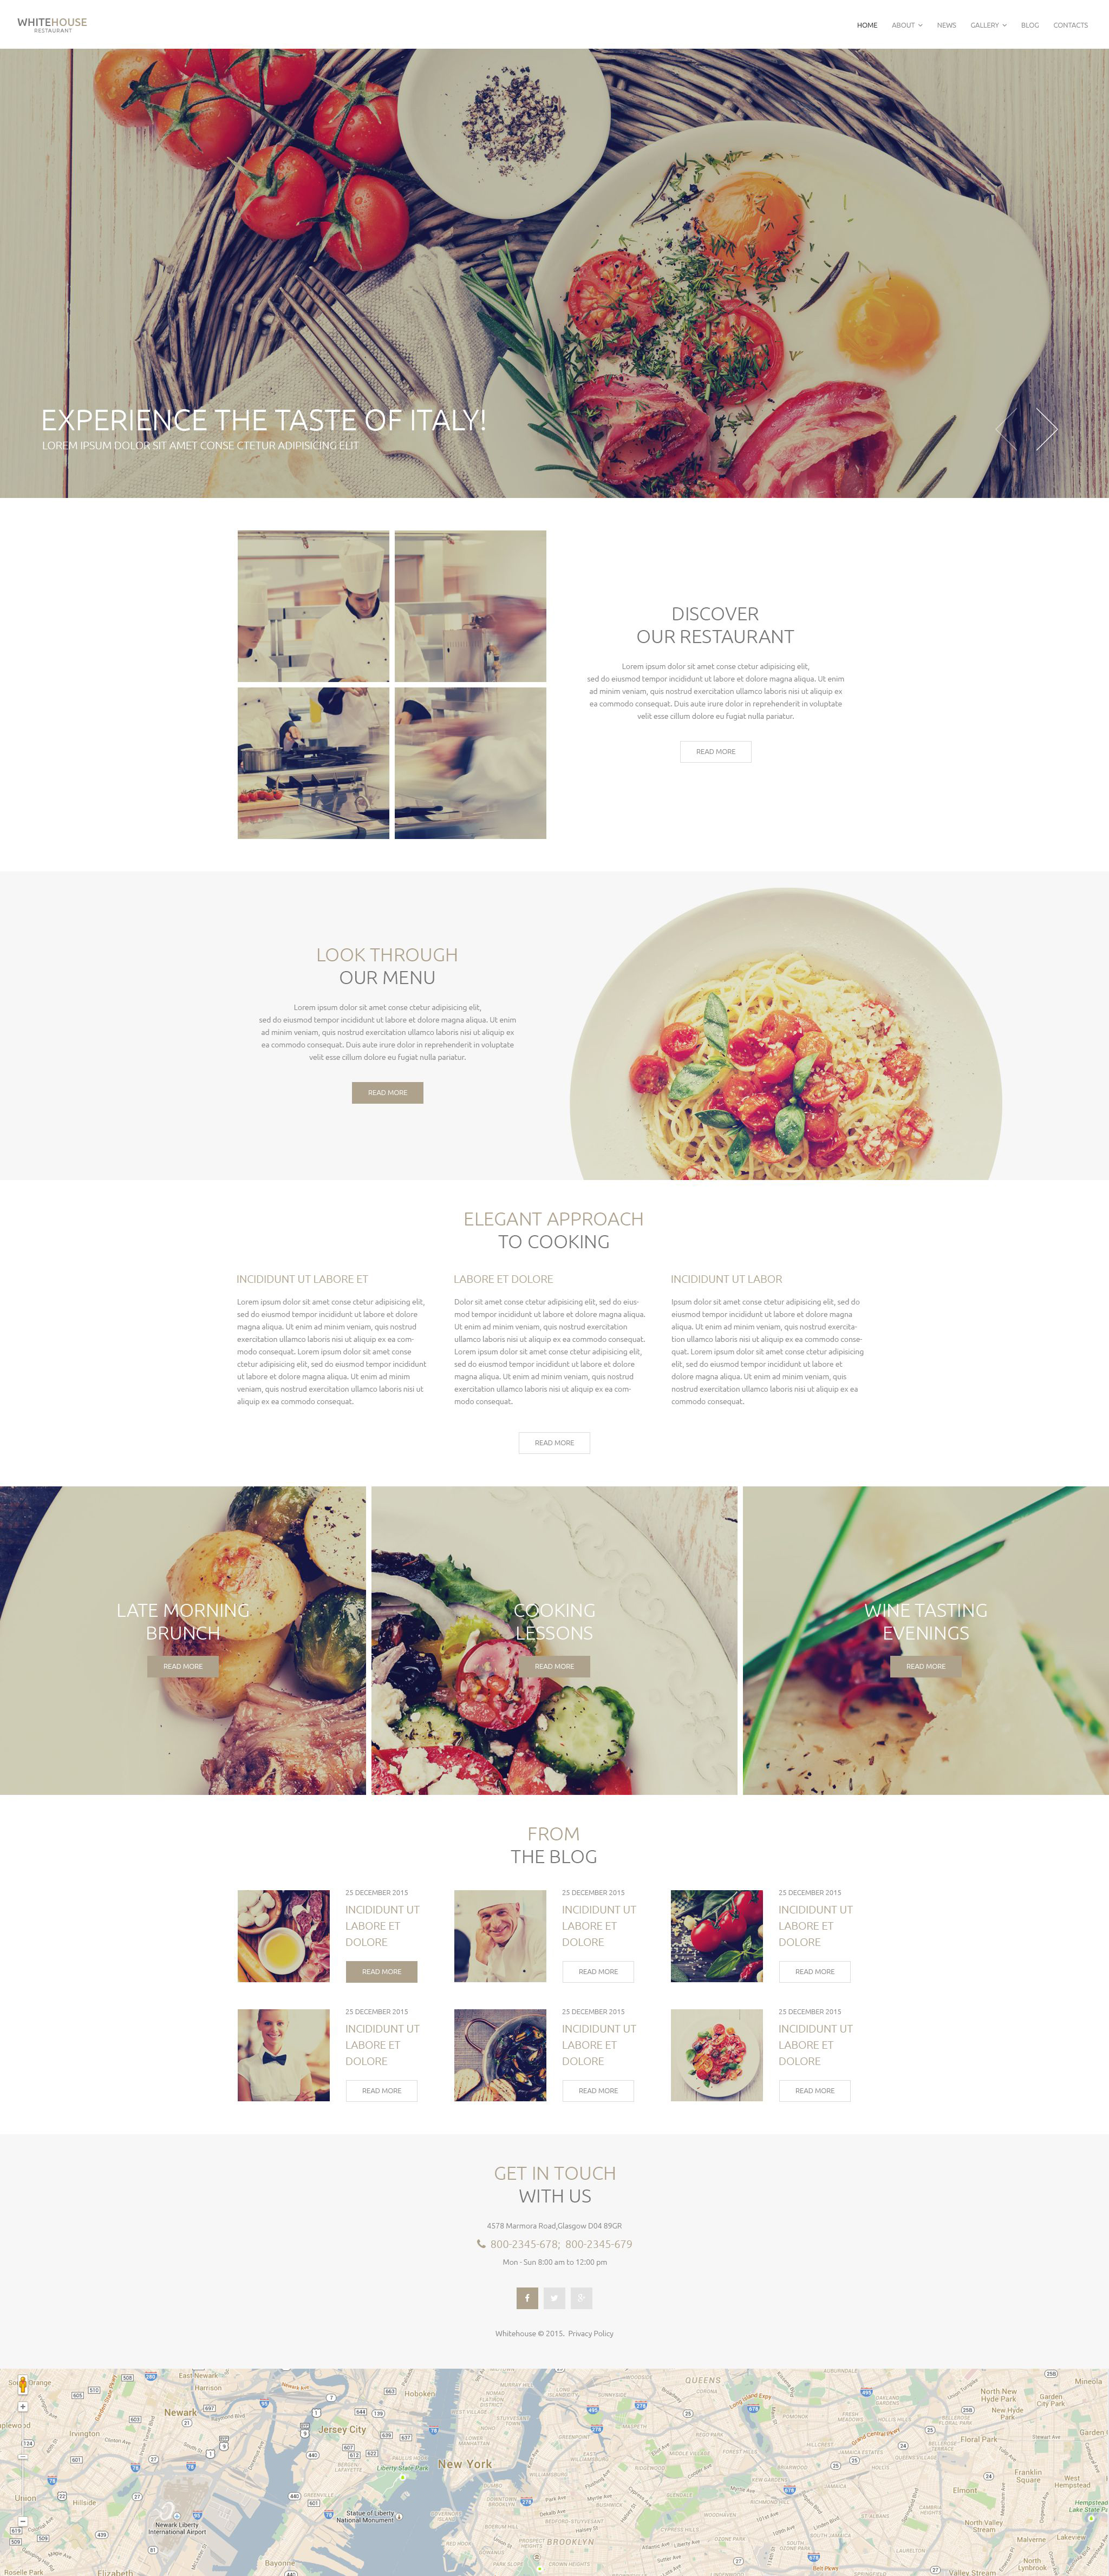 Italian Cuisine Drupal Template - screenshot